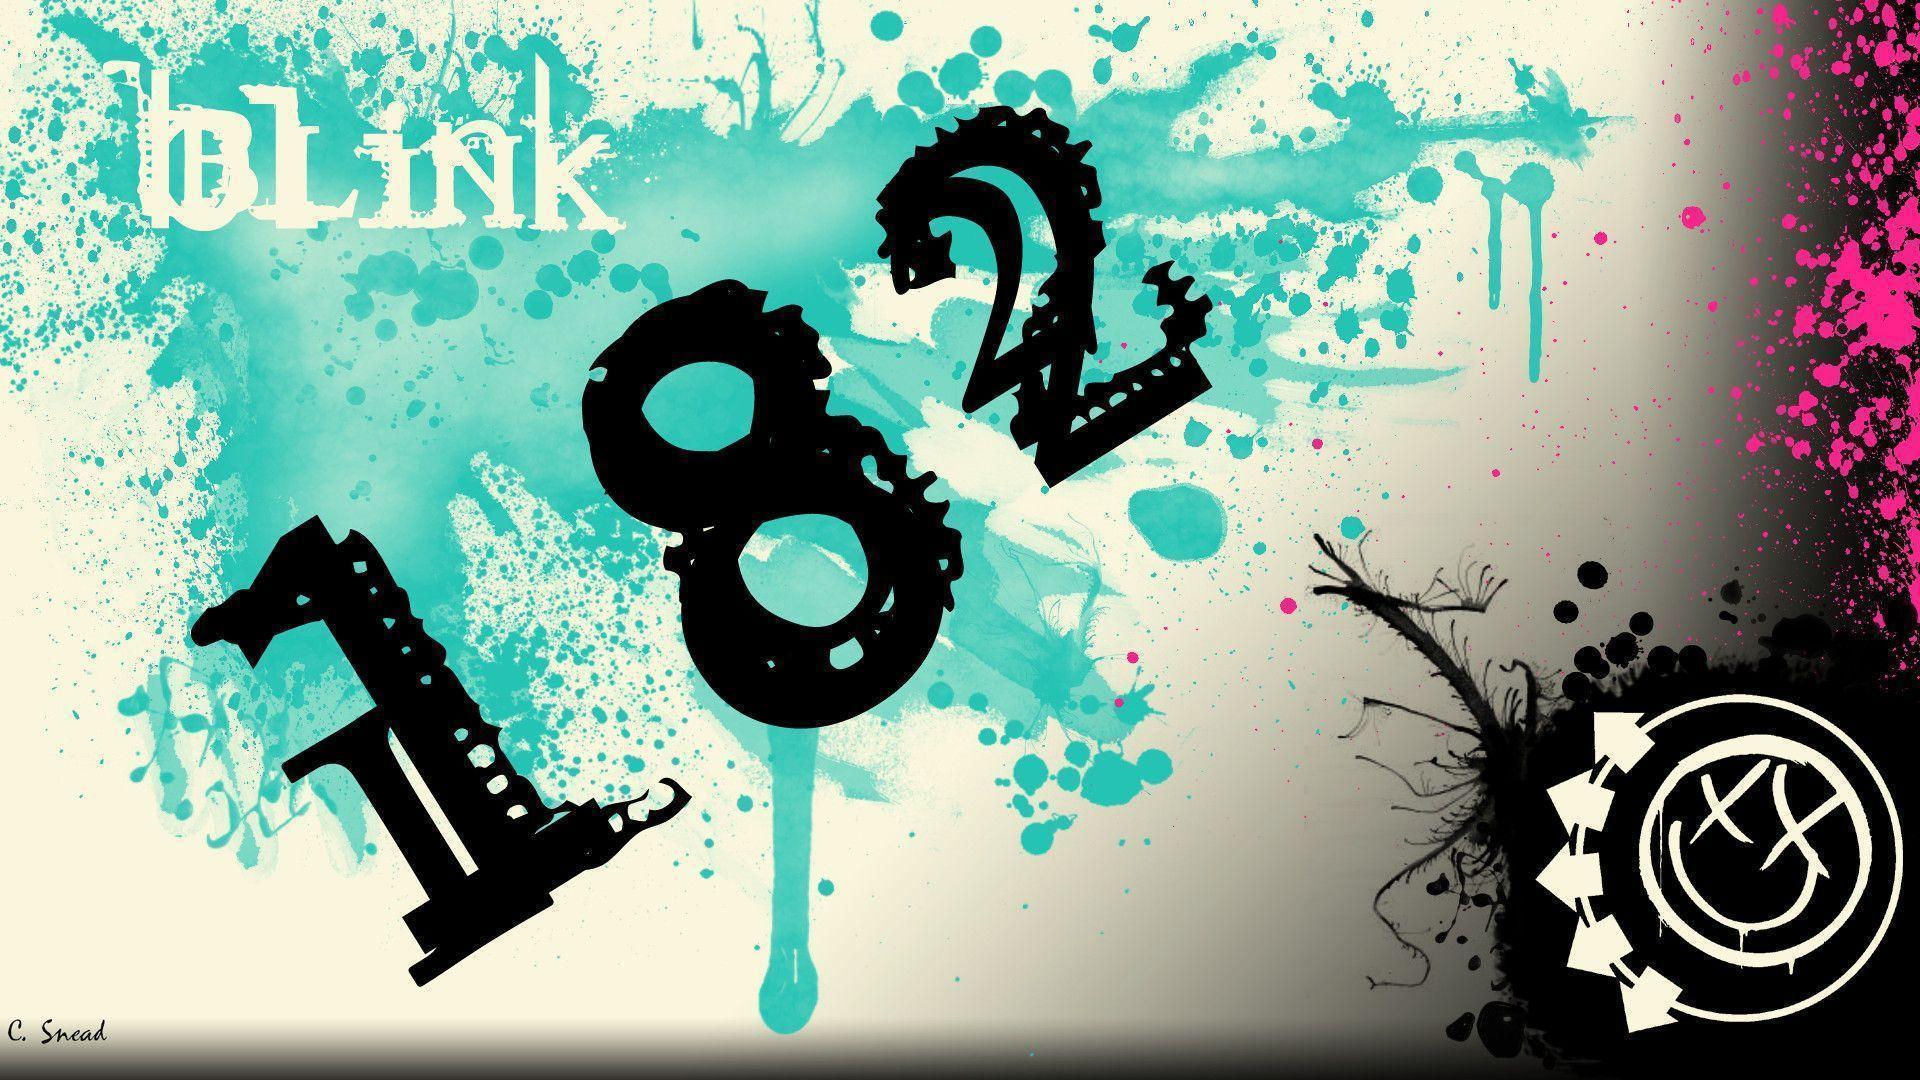 Amazing Blink 182 Wallpaper